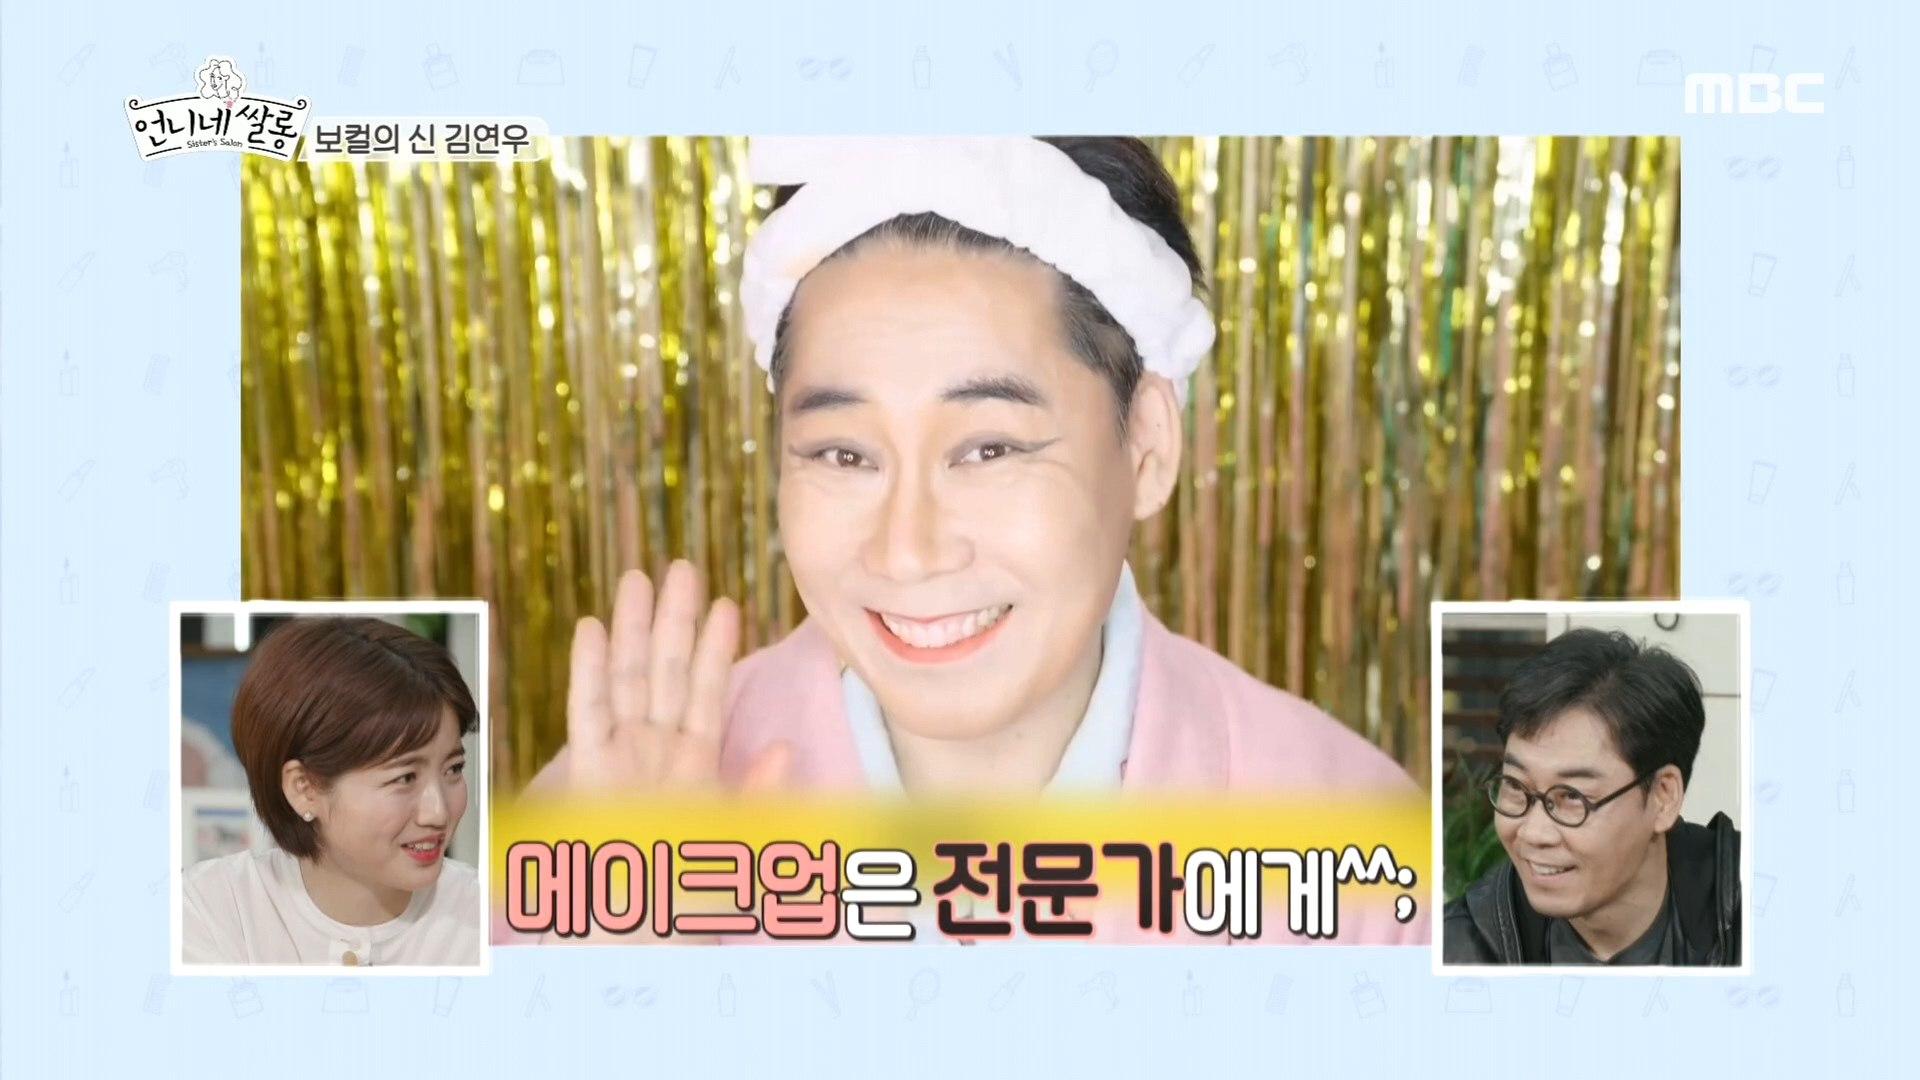 [HOT] Kim Yeon-woo parodies, 언니네 쌀롱 20191111